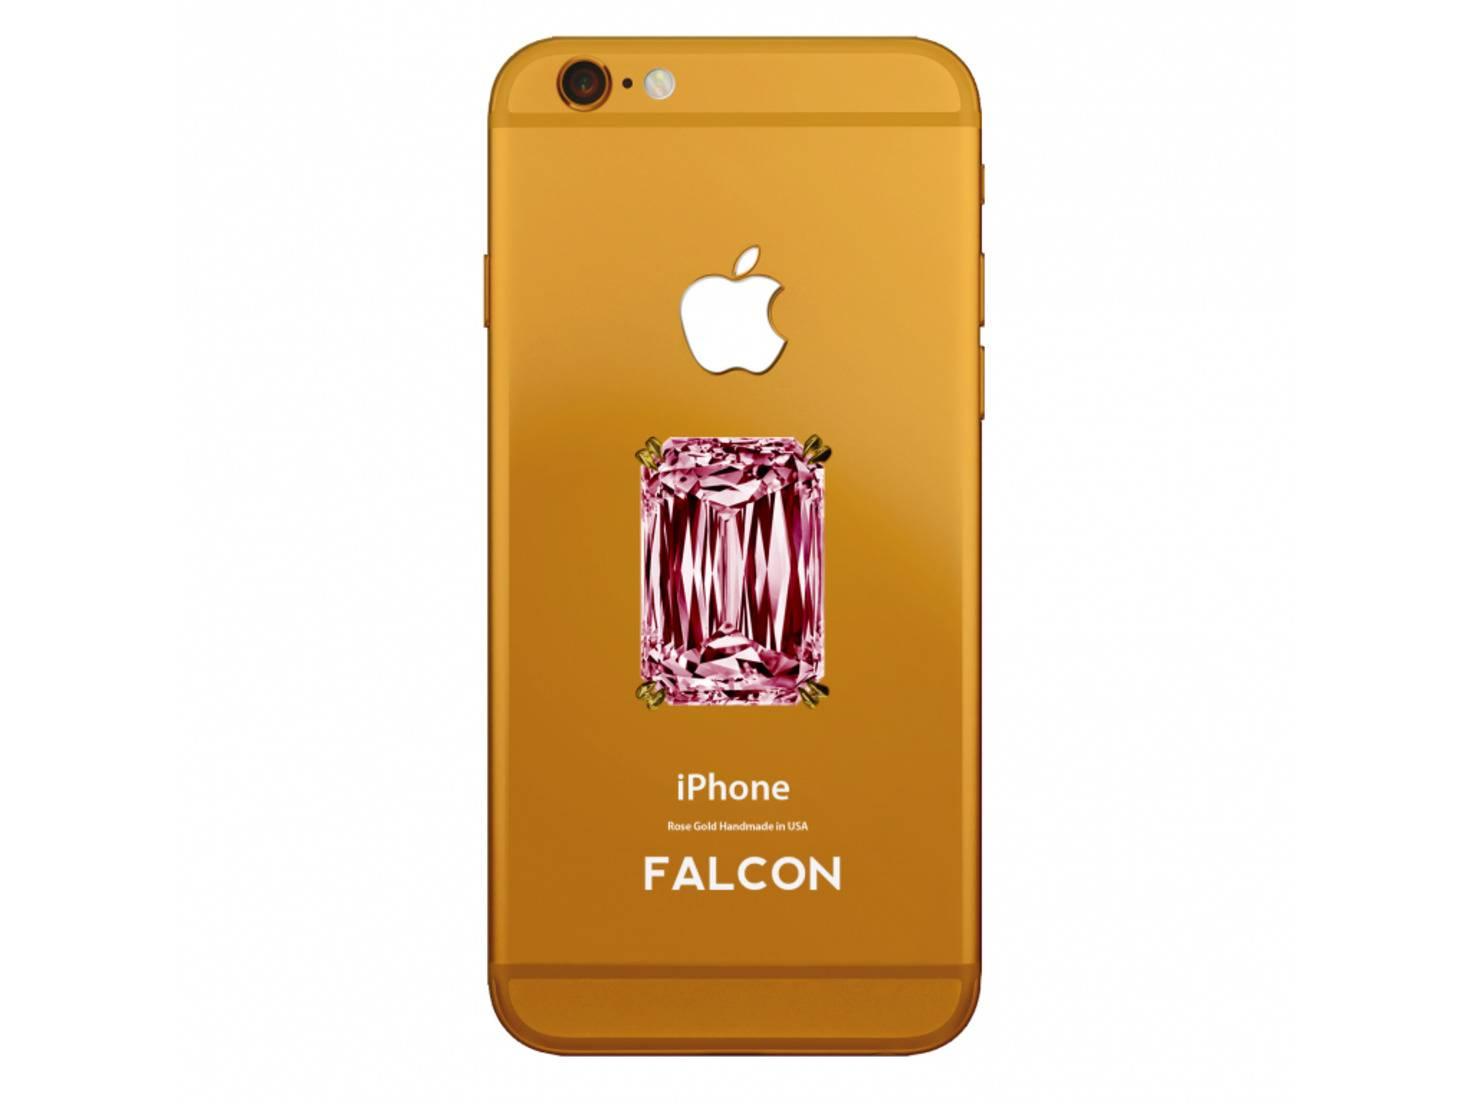 Falcon_iPhone